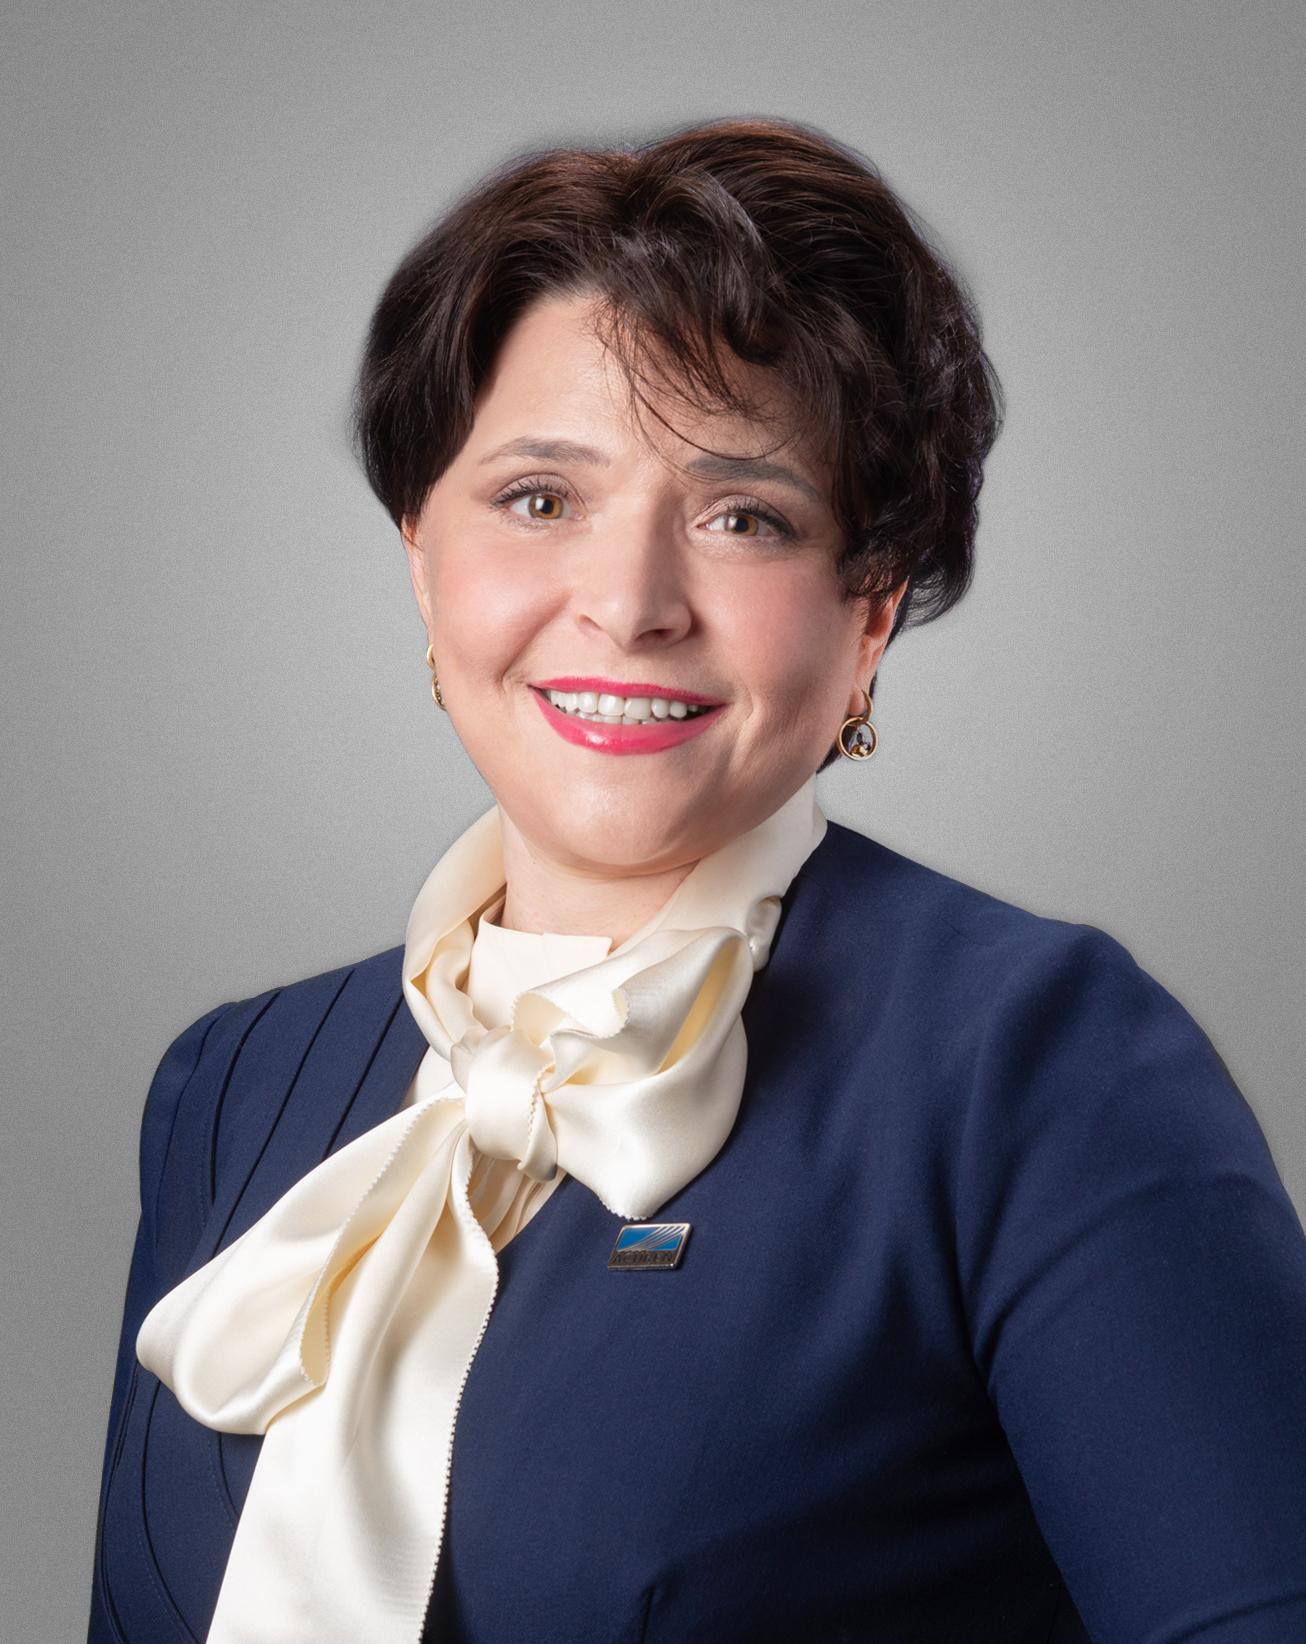 Yulia S. Austin